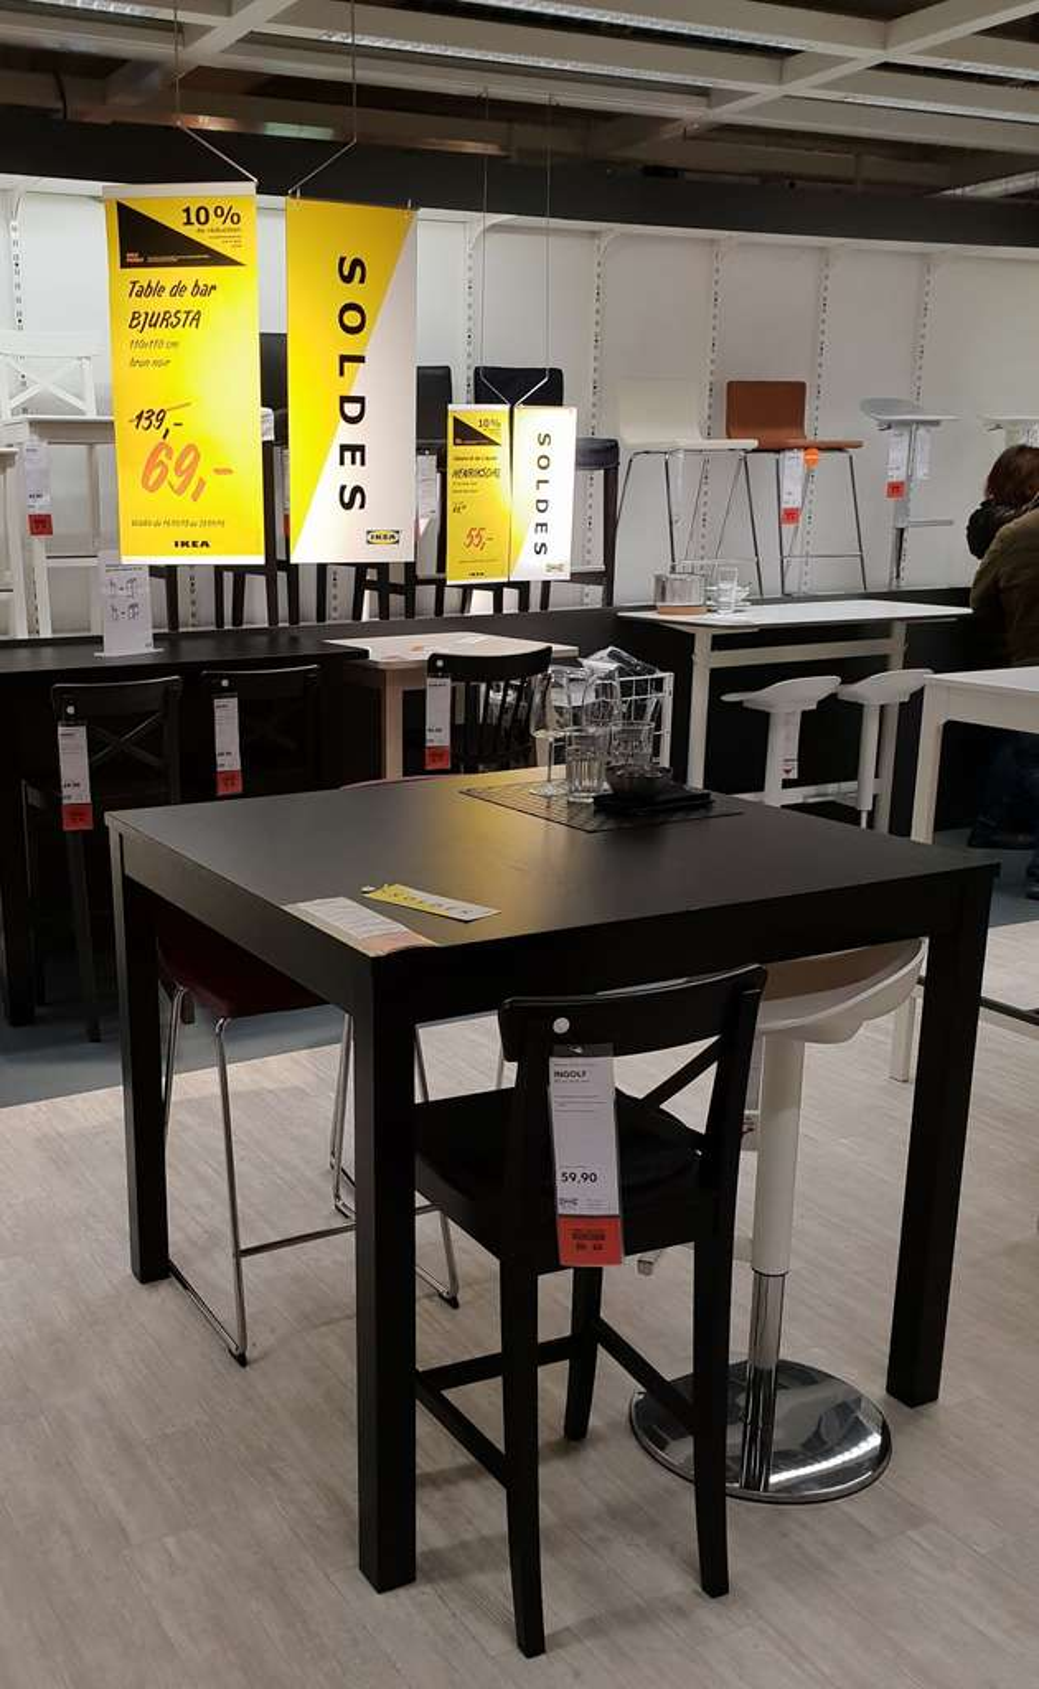 Table De Bar Bjursta Frontaliers Belgique Arlon Dealabs Com